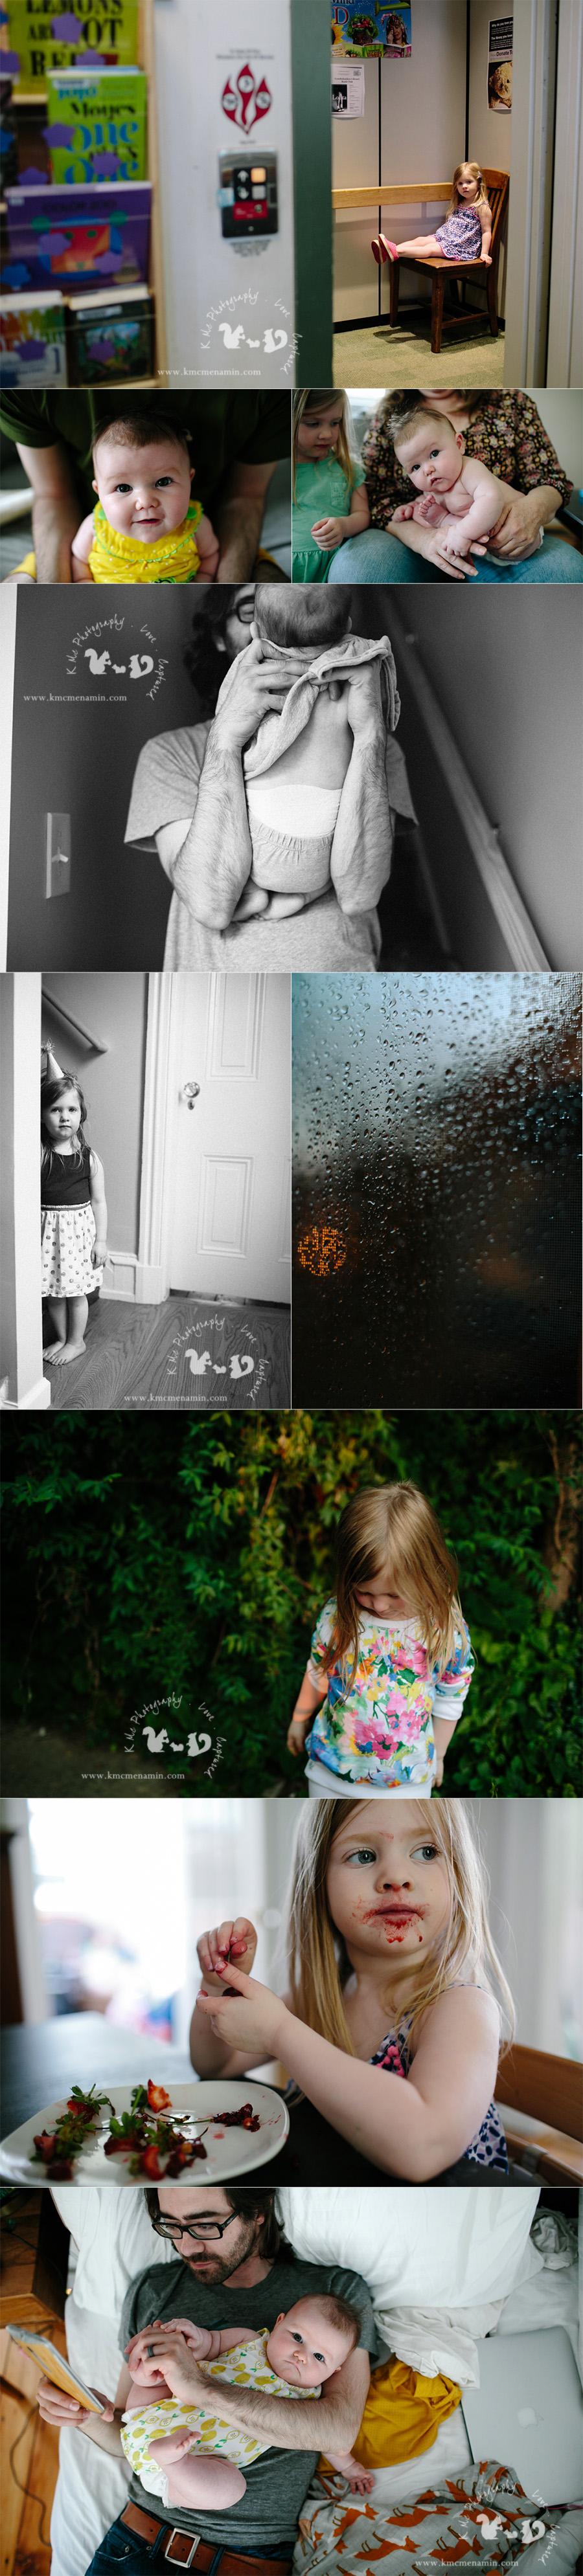 Conshohocken_Family_Photographer_15